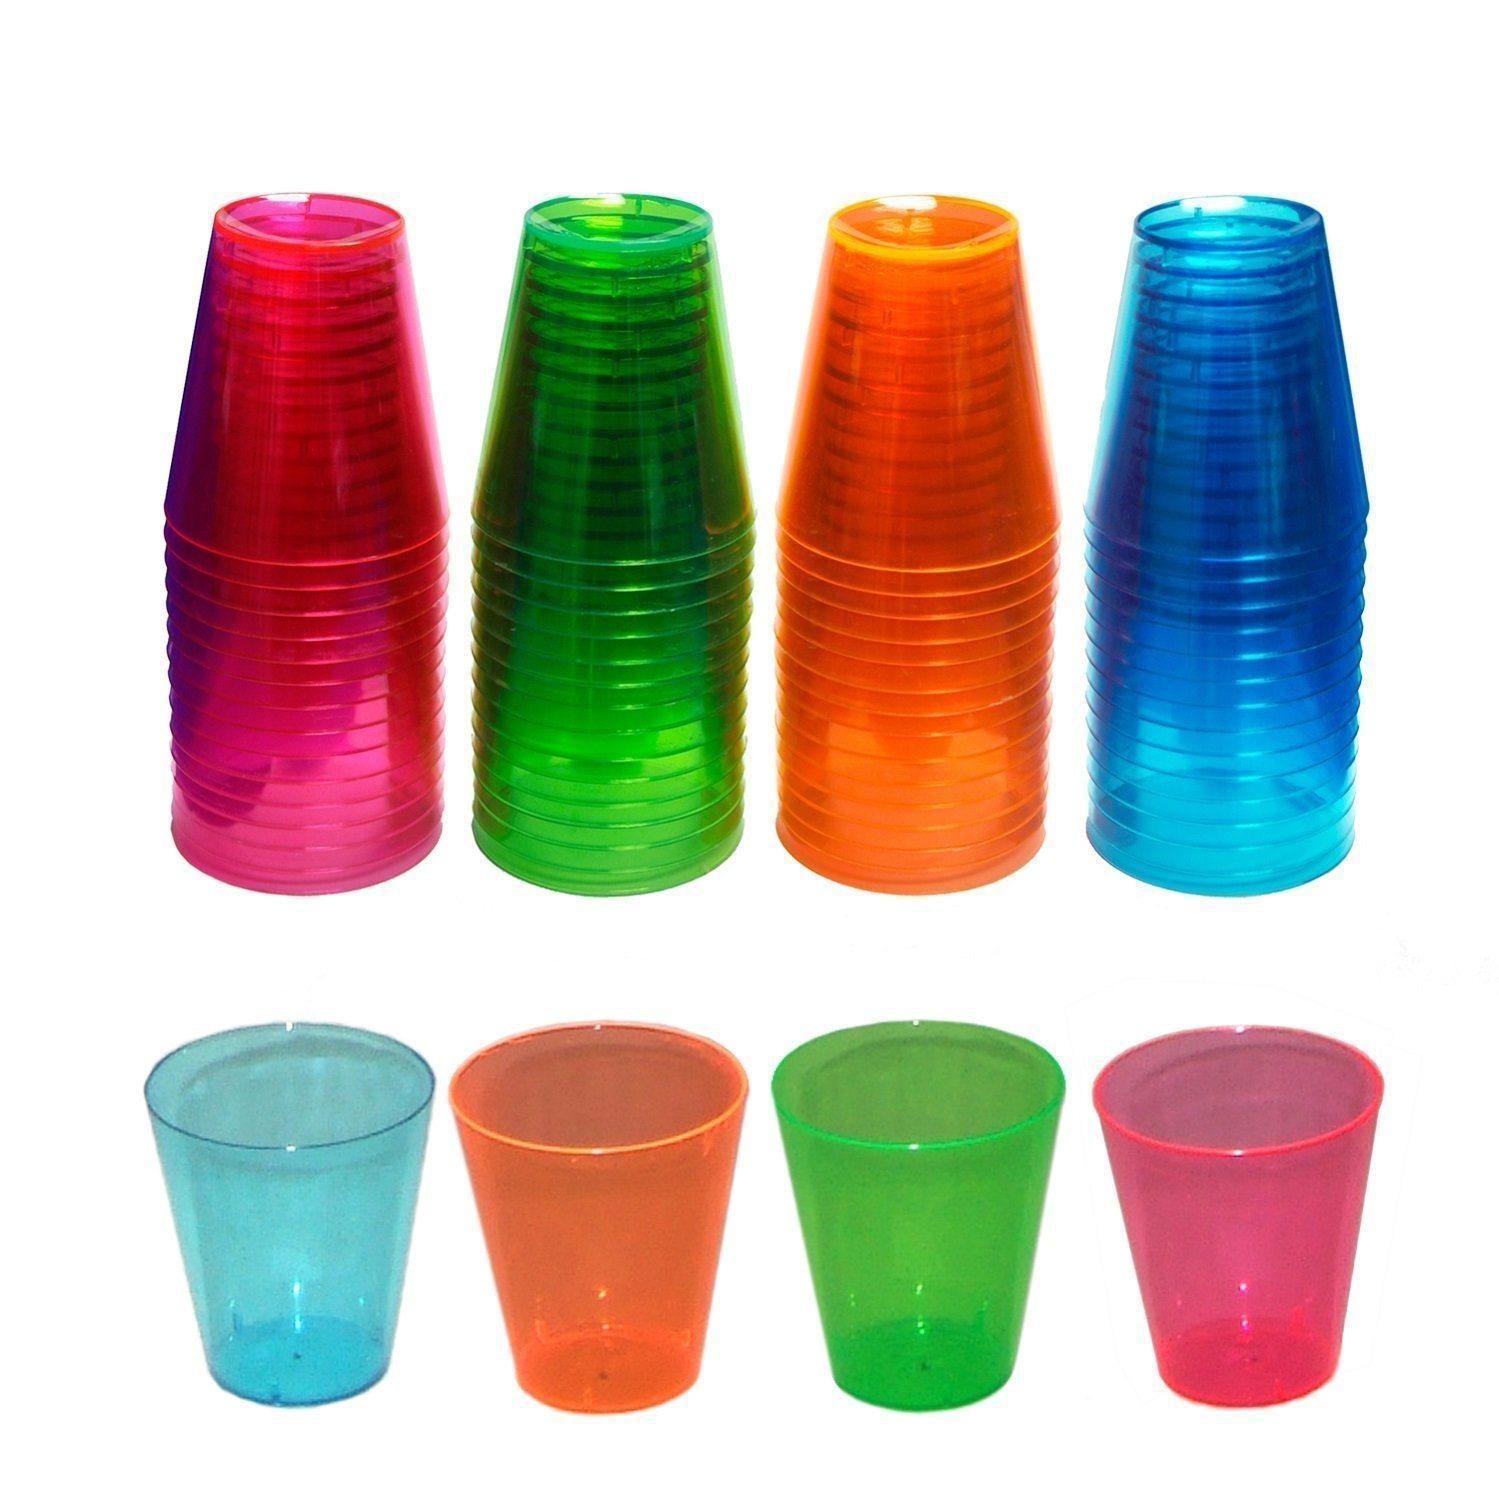 Party Essentials Round Clear Multicolor Ware Plastic Shot Glasses